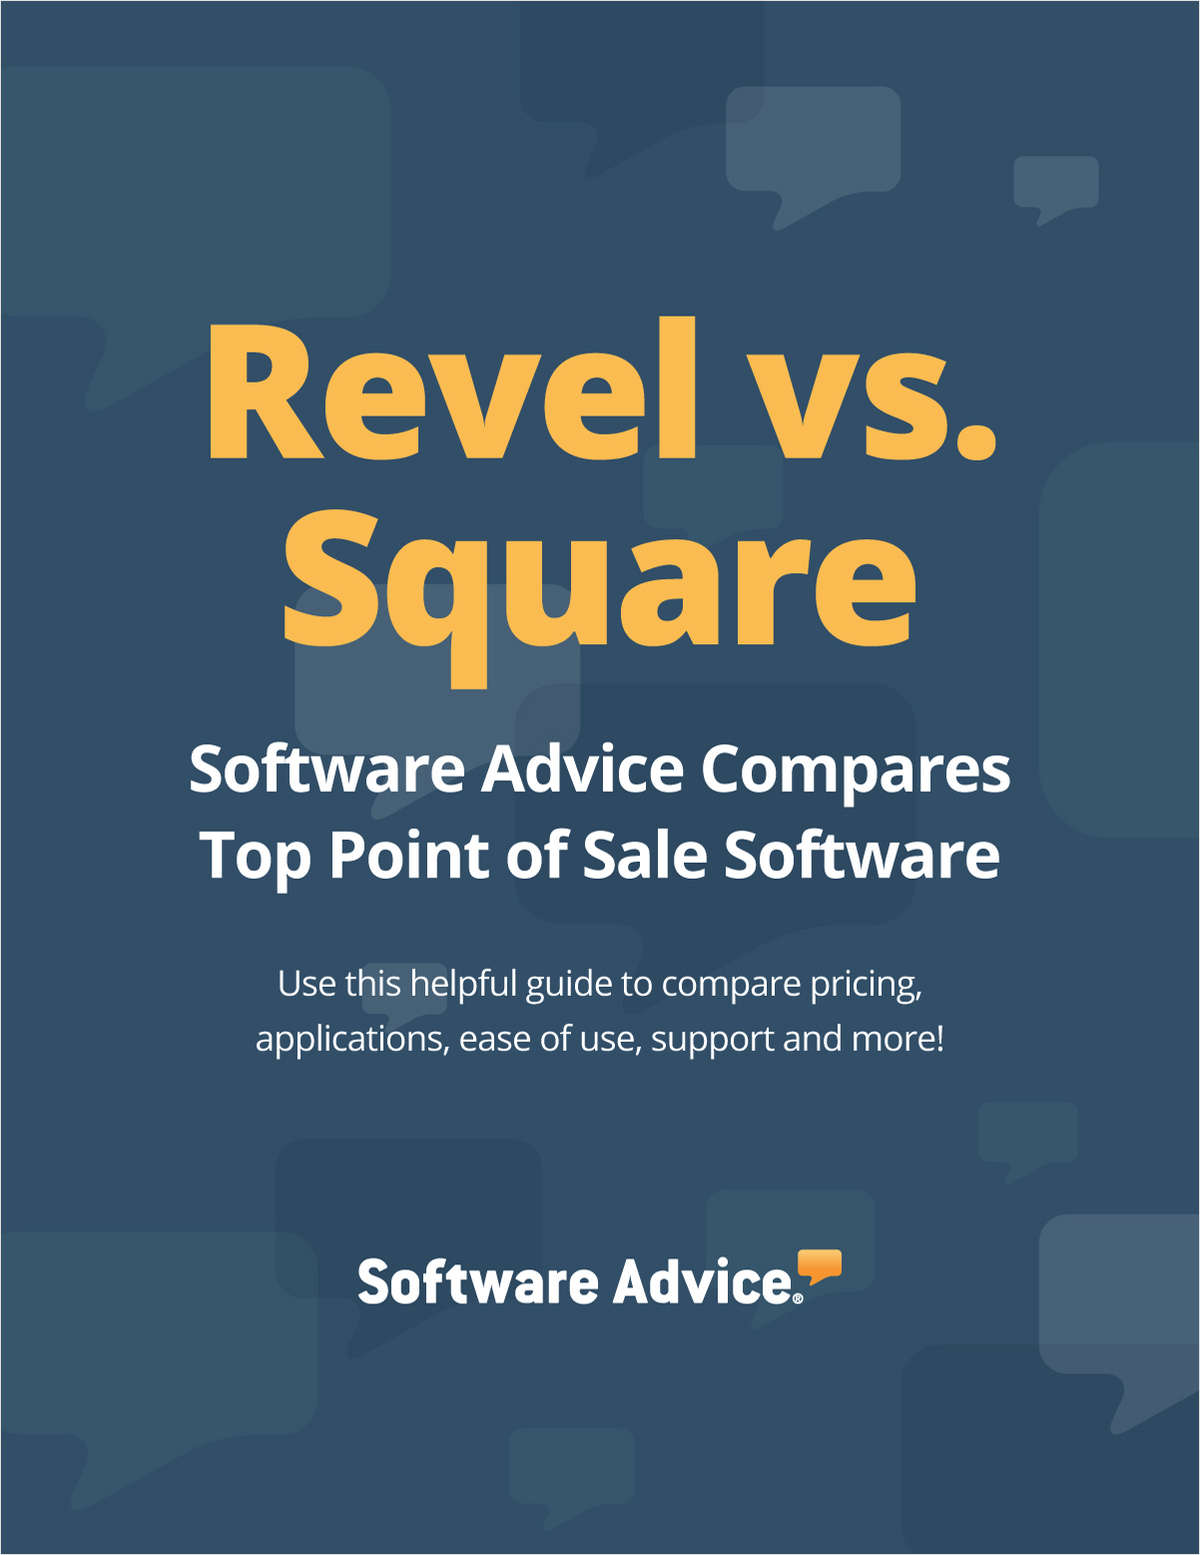 Revel vs. Square - Compare Top Retail Software Systems